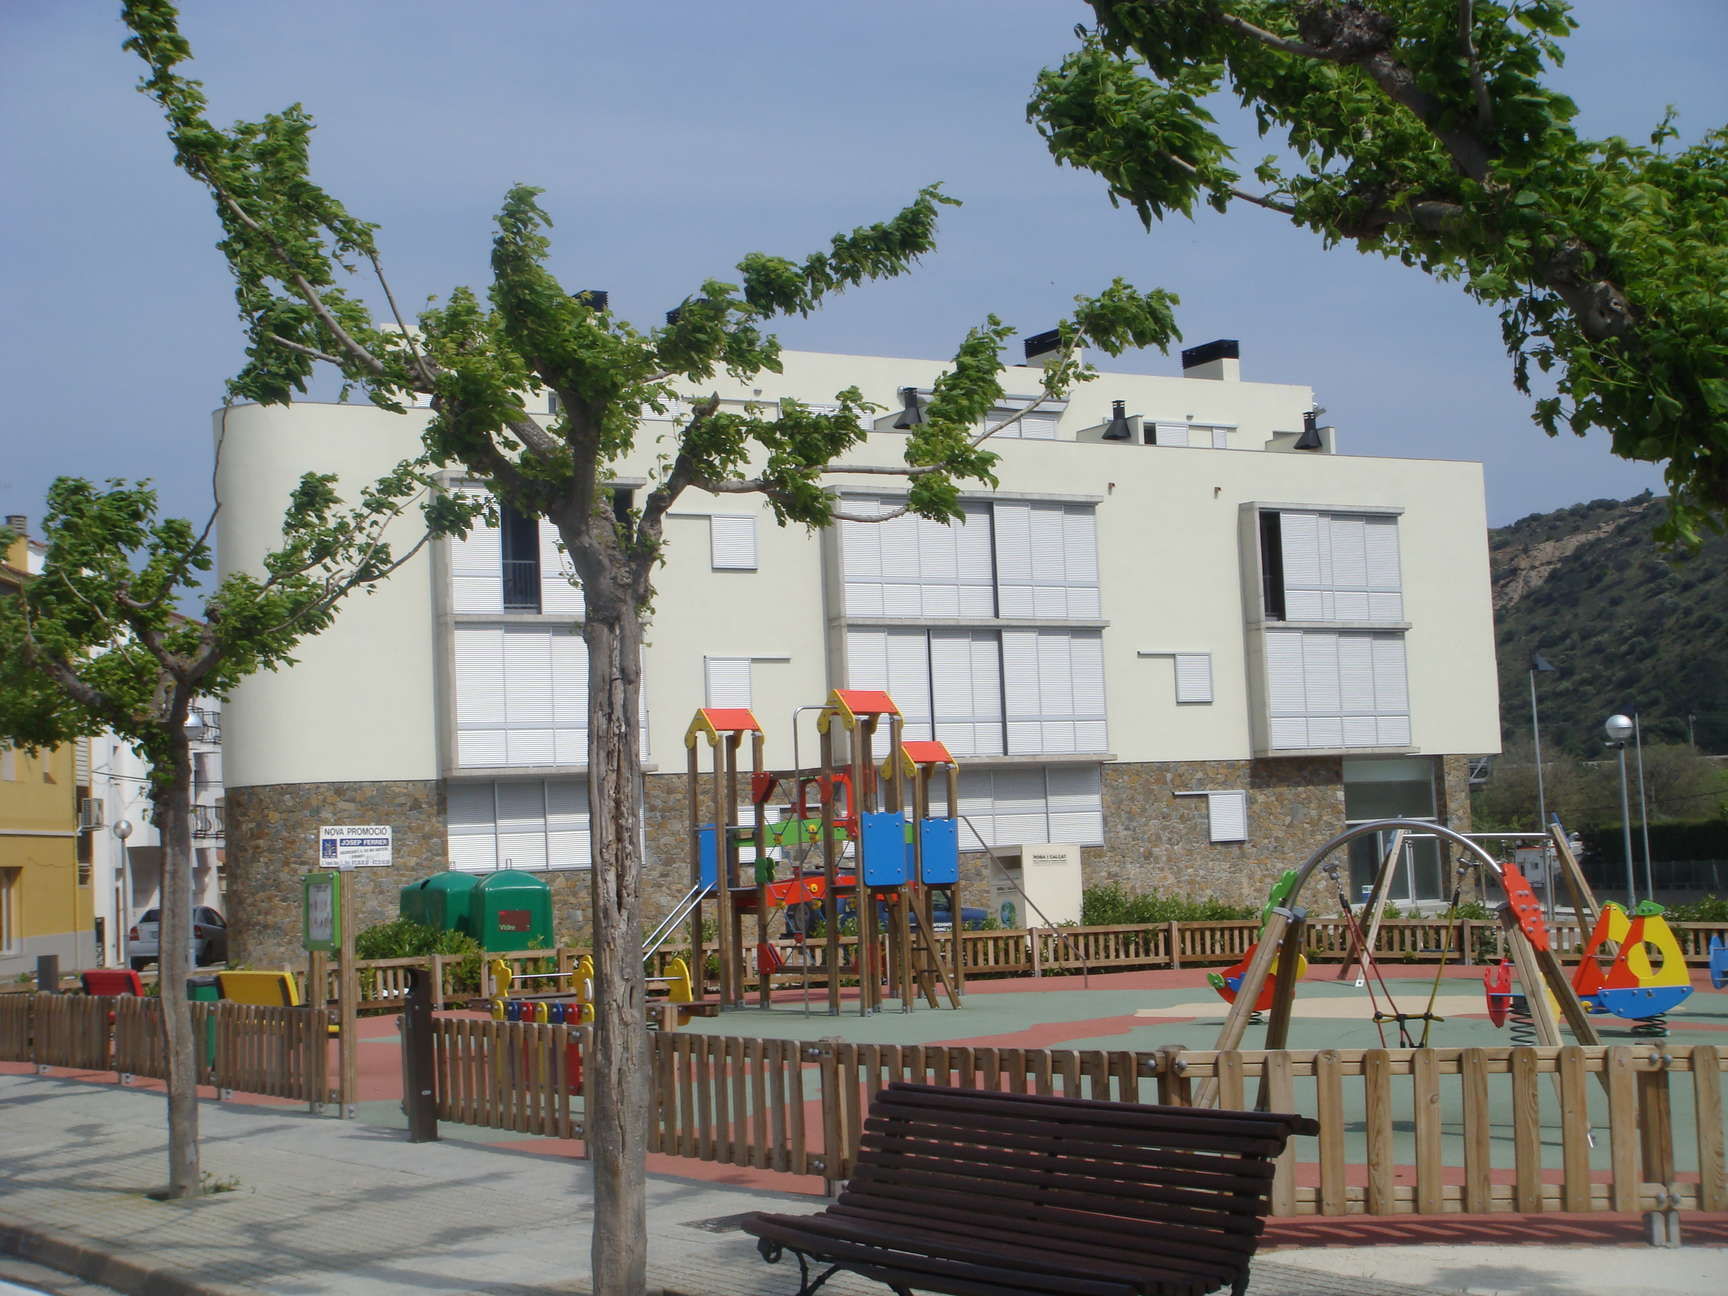 Venta piso con terraza y barbacoa muy luminoso girona alt for Pisos alquiler alt emporda